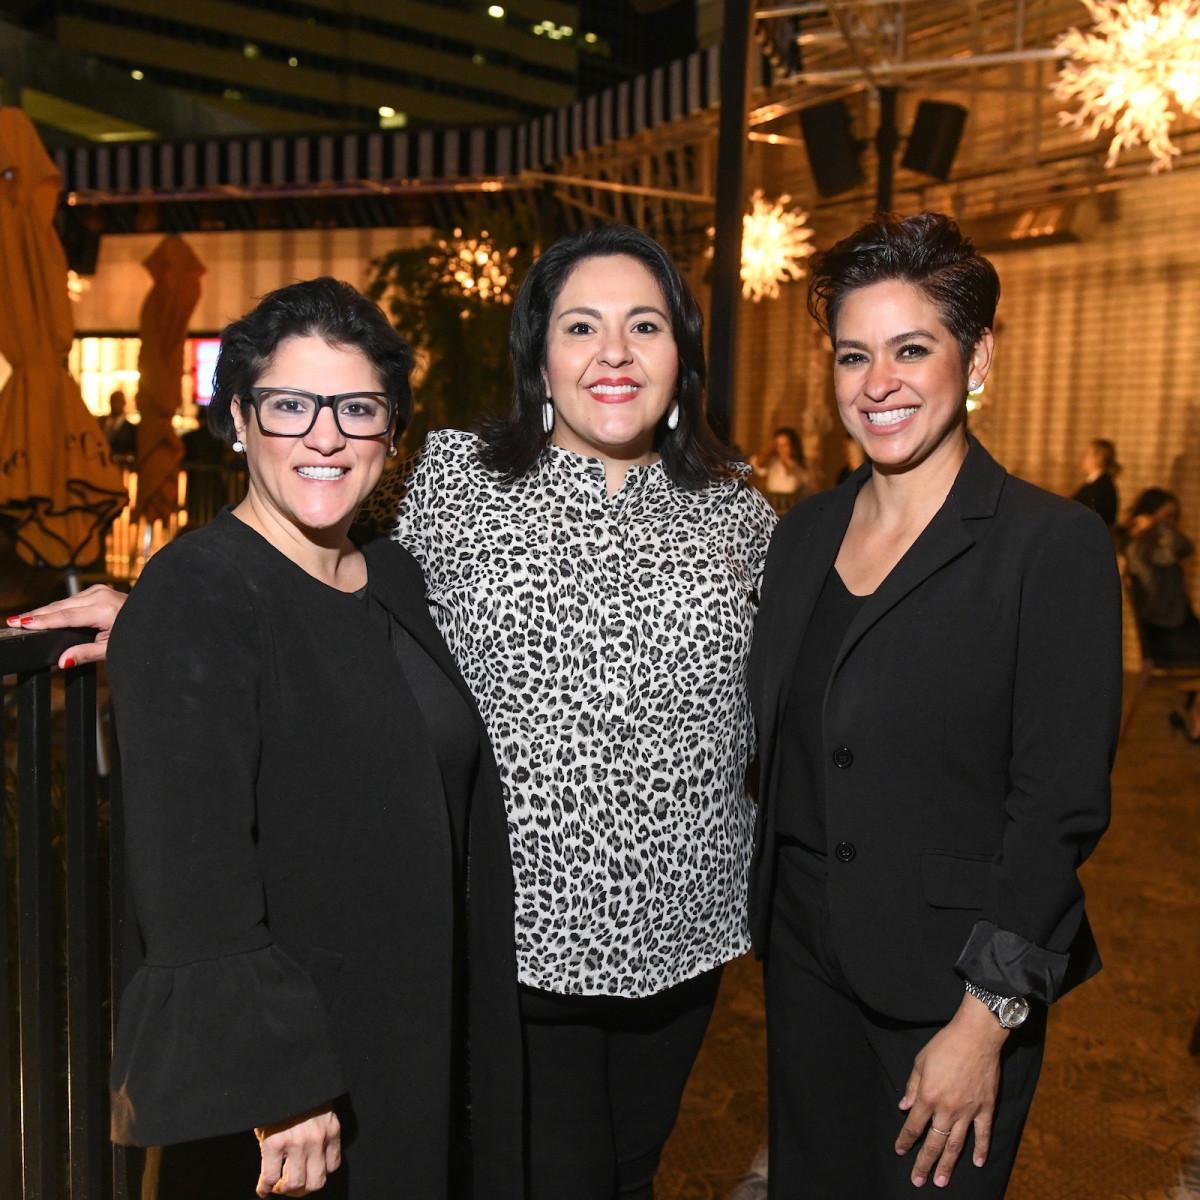 Xochitl DeLaCruz, Marisol Valdovinos, Karina Azuara